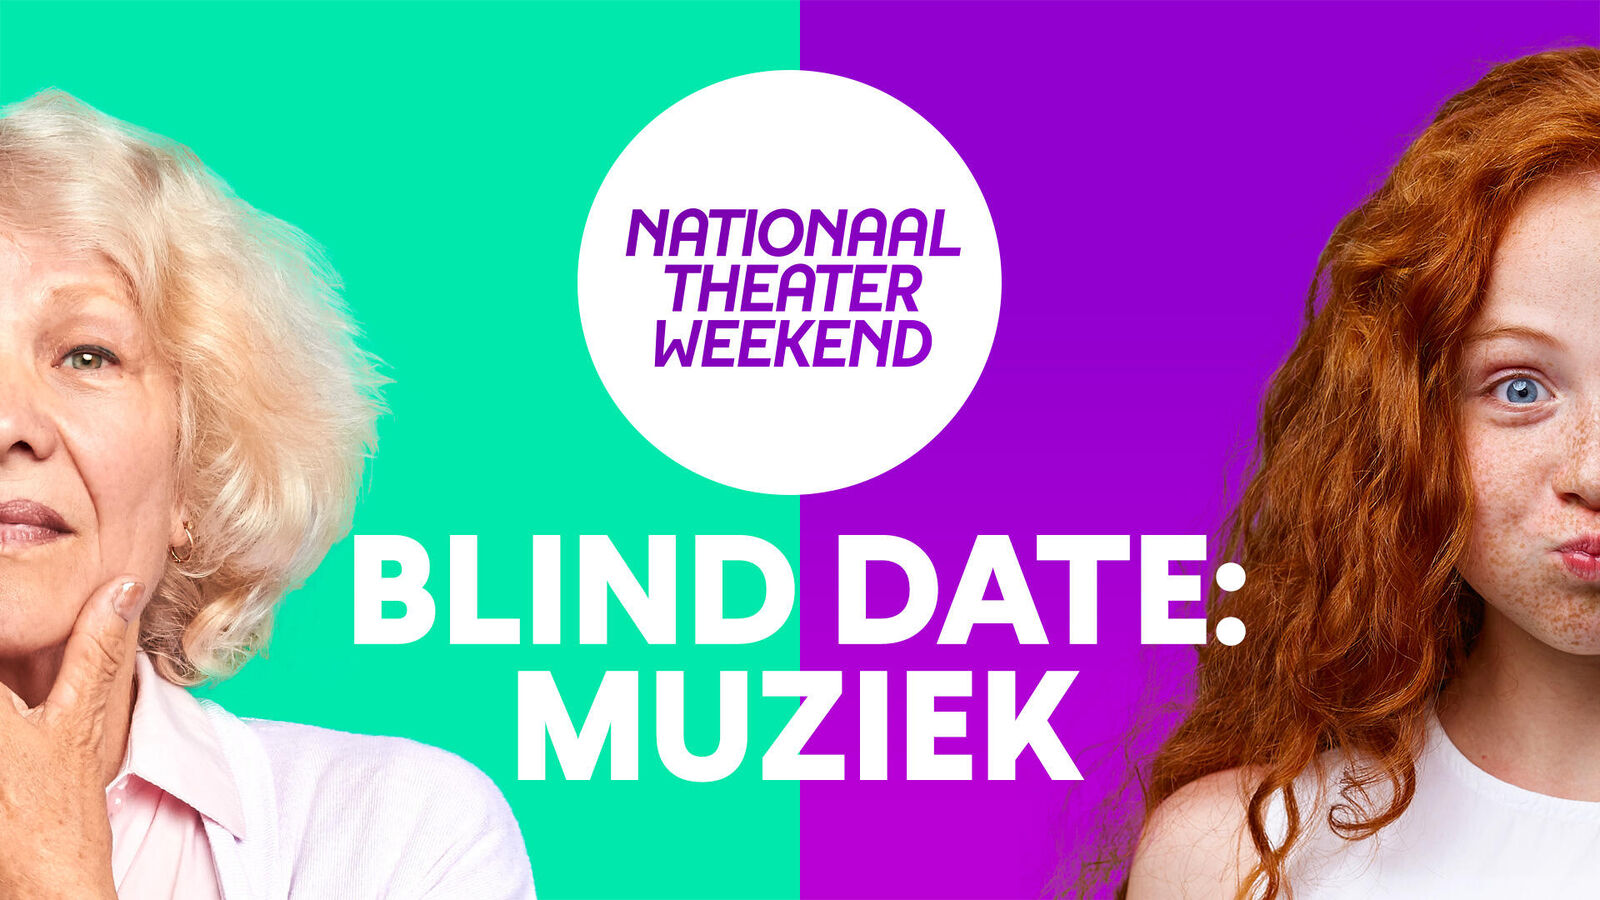 Blind date - muziek